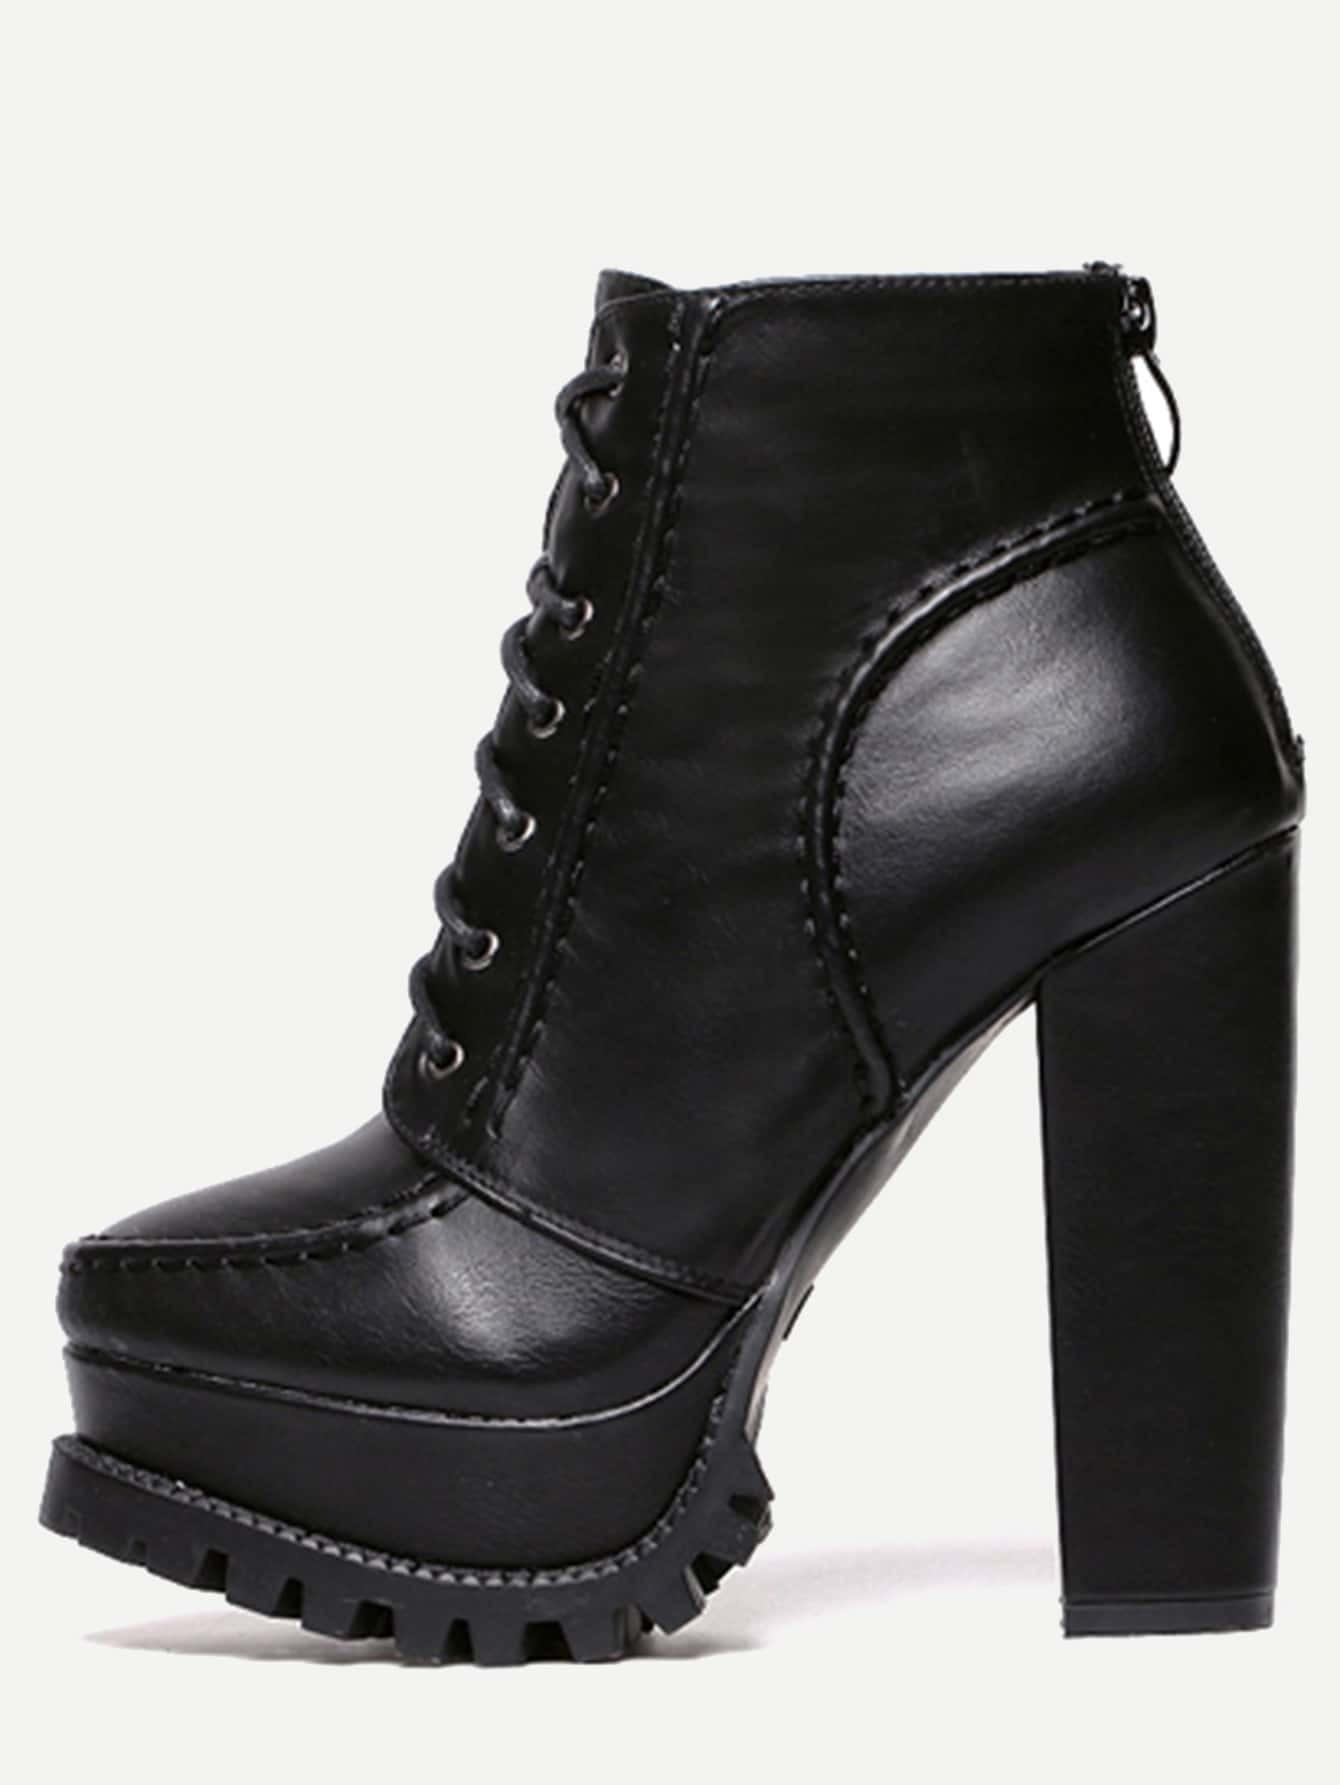 black faux leather lace up back zipper boots